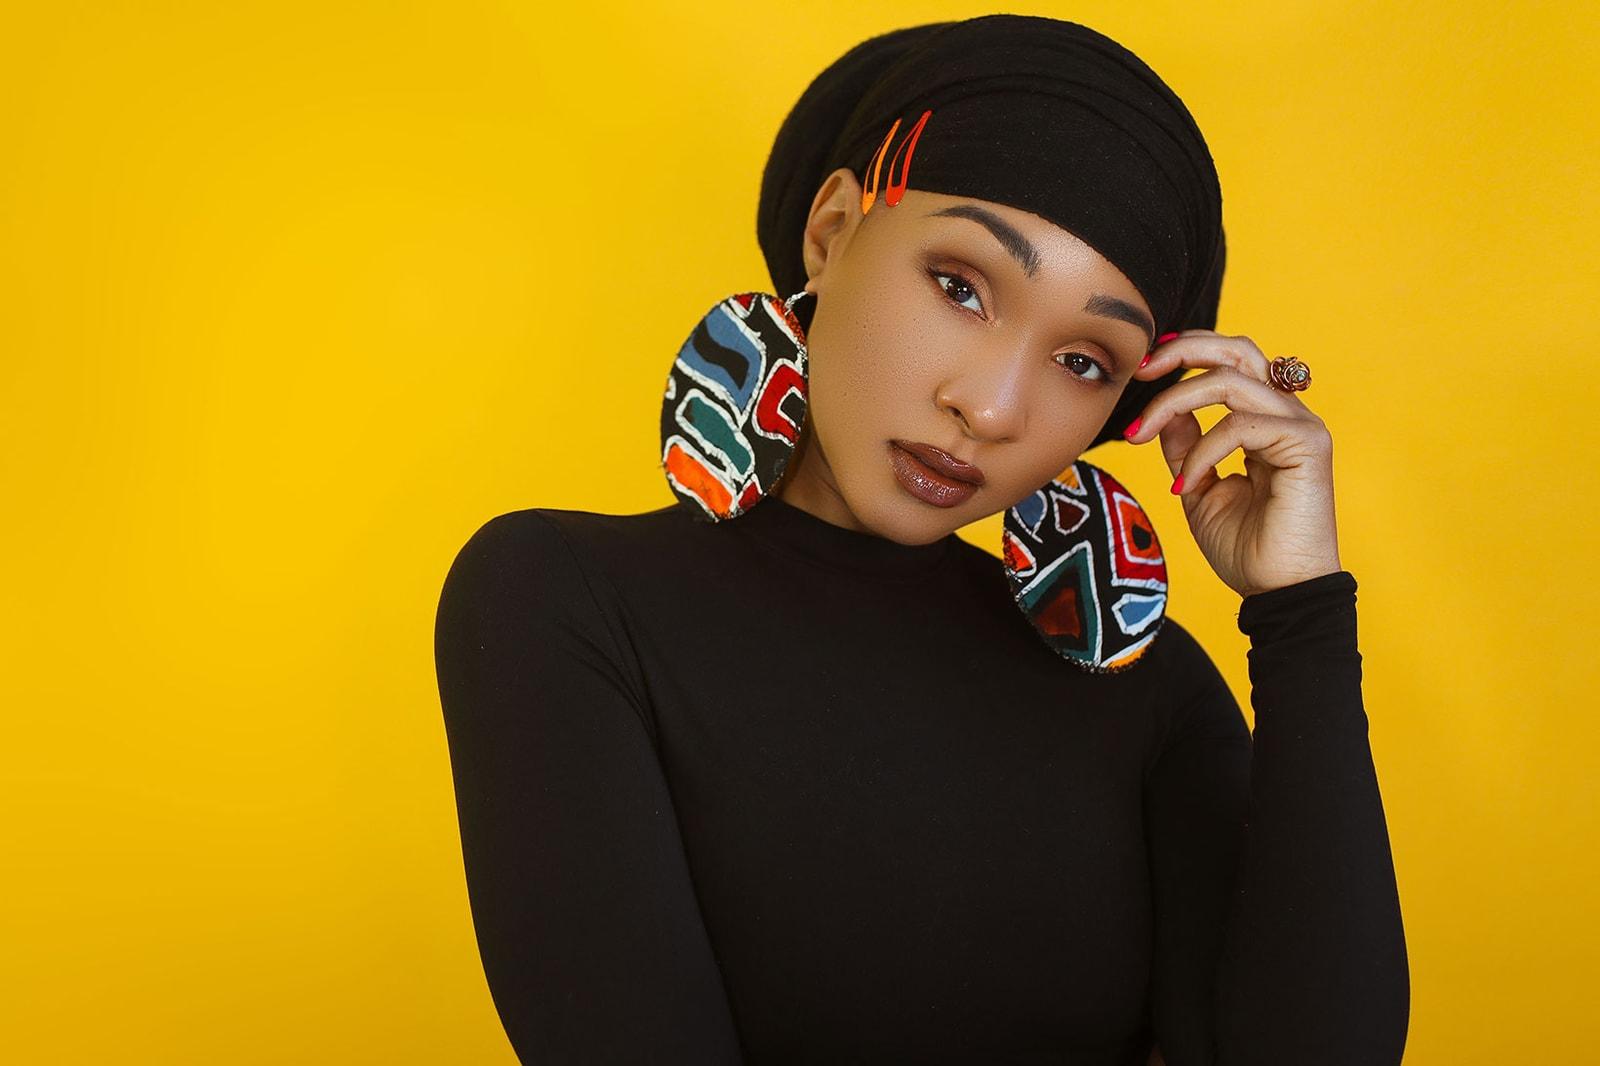 alia sharrief the hijab chronicles founder muslim women's day hip hop artist musician performer rapper